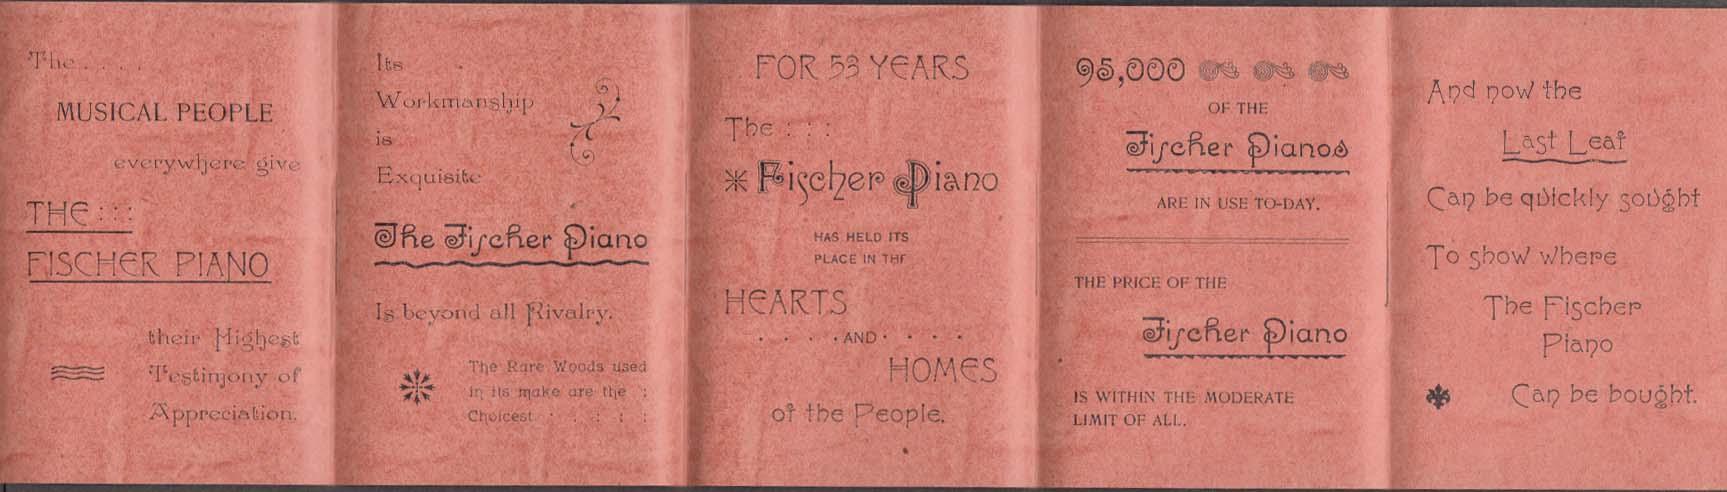 Fischer Piano Warerooms 5th Avenue New York City folder mailer 1893